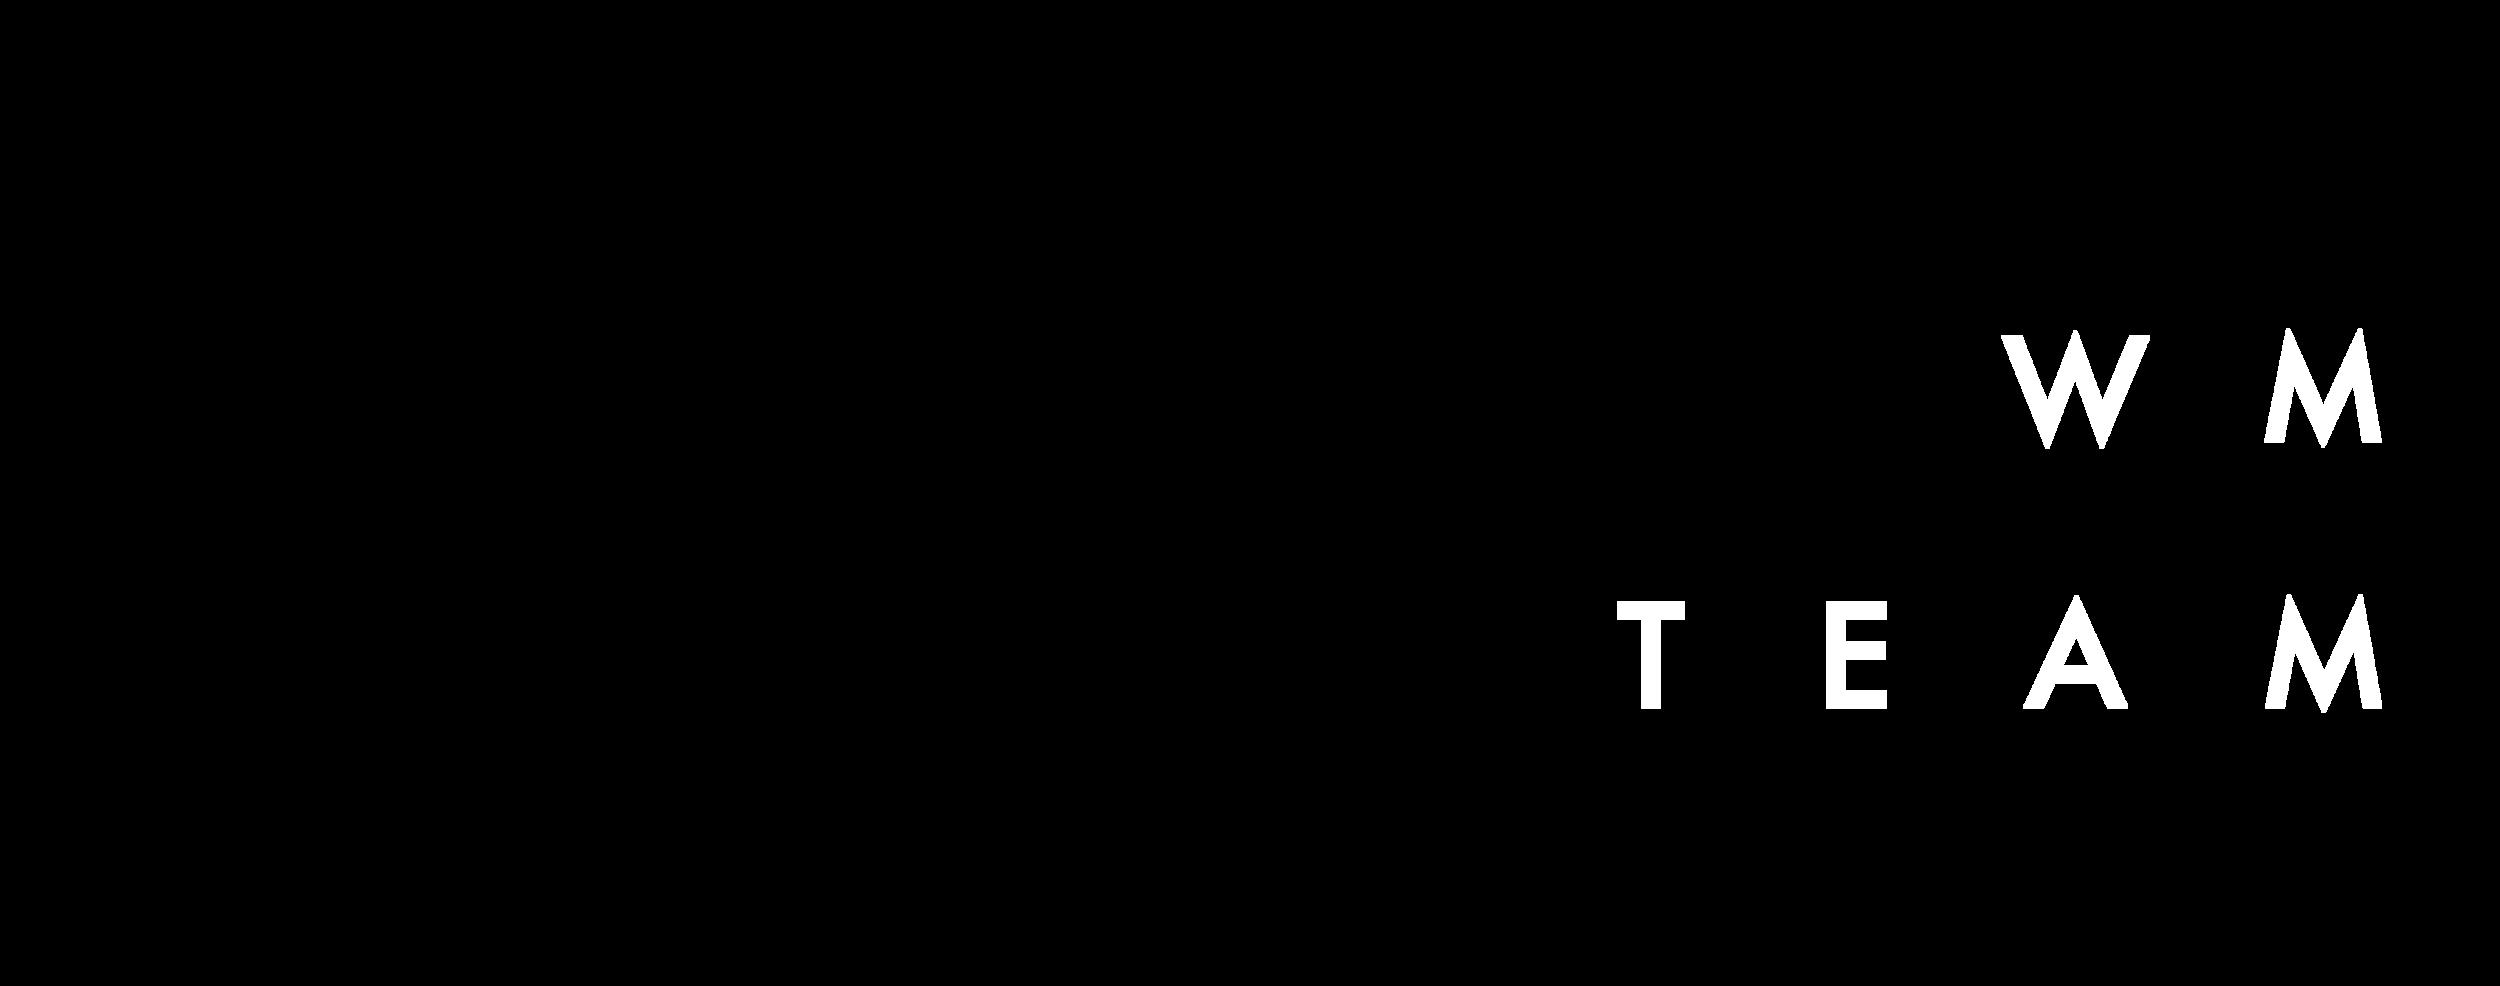 Textpremierepage-04-03.png